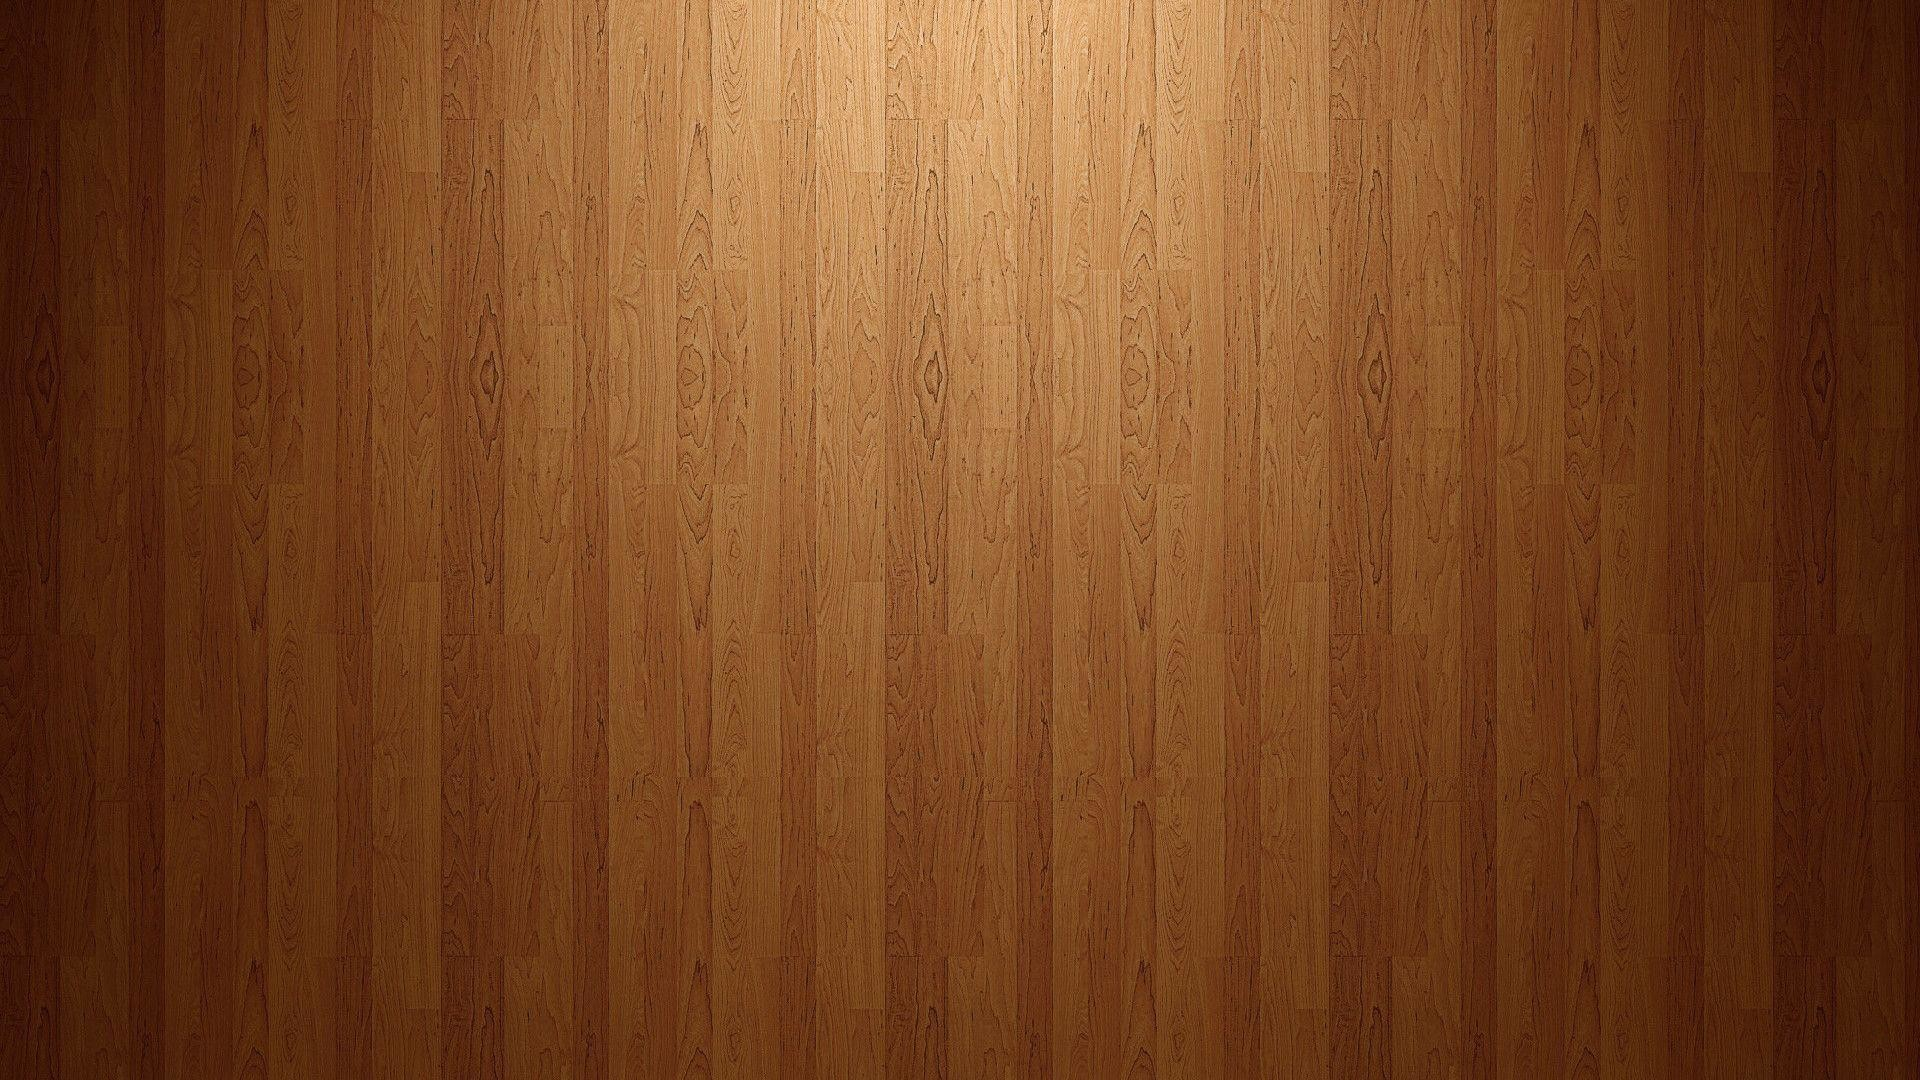 Wood wallpaper 1080p 73 images 1920x1080 wood texture wood texture 1920x1080 hd 1080p hd wallpaper voltagebd Choice Image